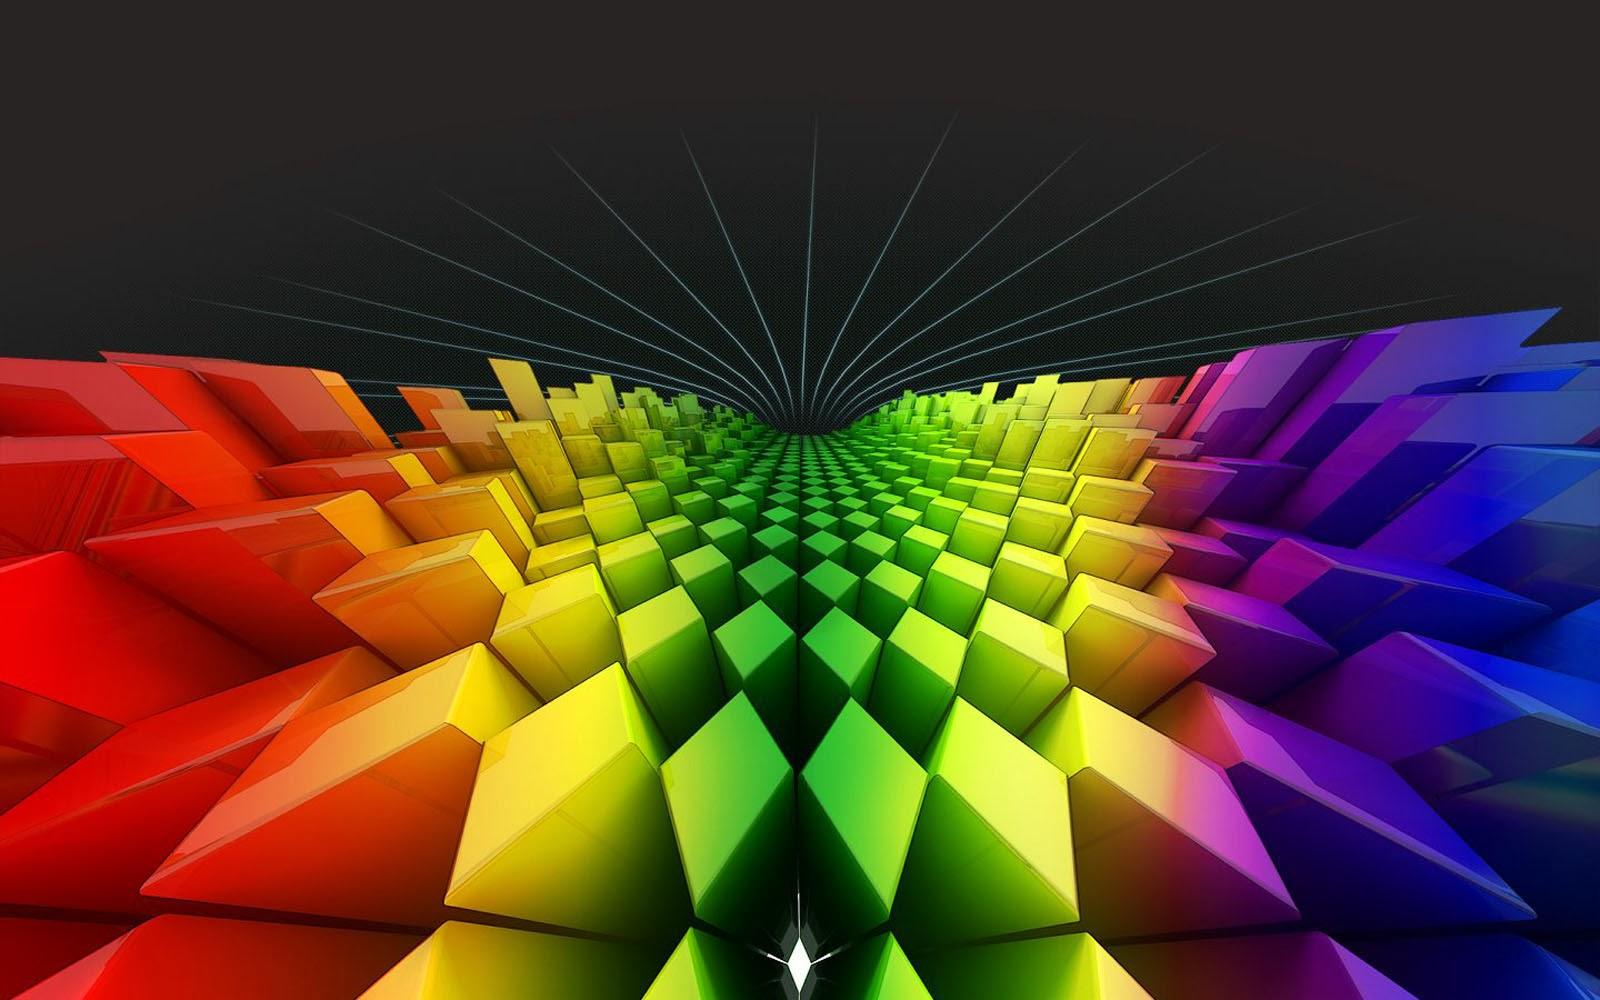 Rainbow Wallpaper Desktop: Wallpapers: Geometry Rainbow Colours Wallpapers